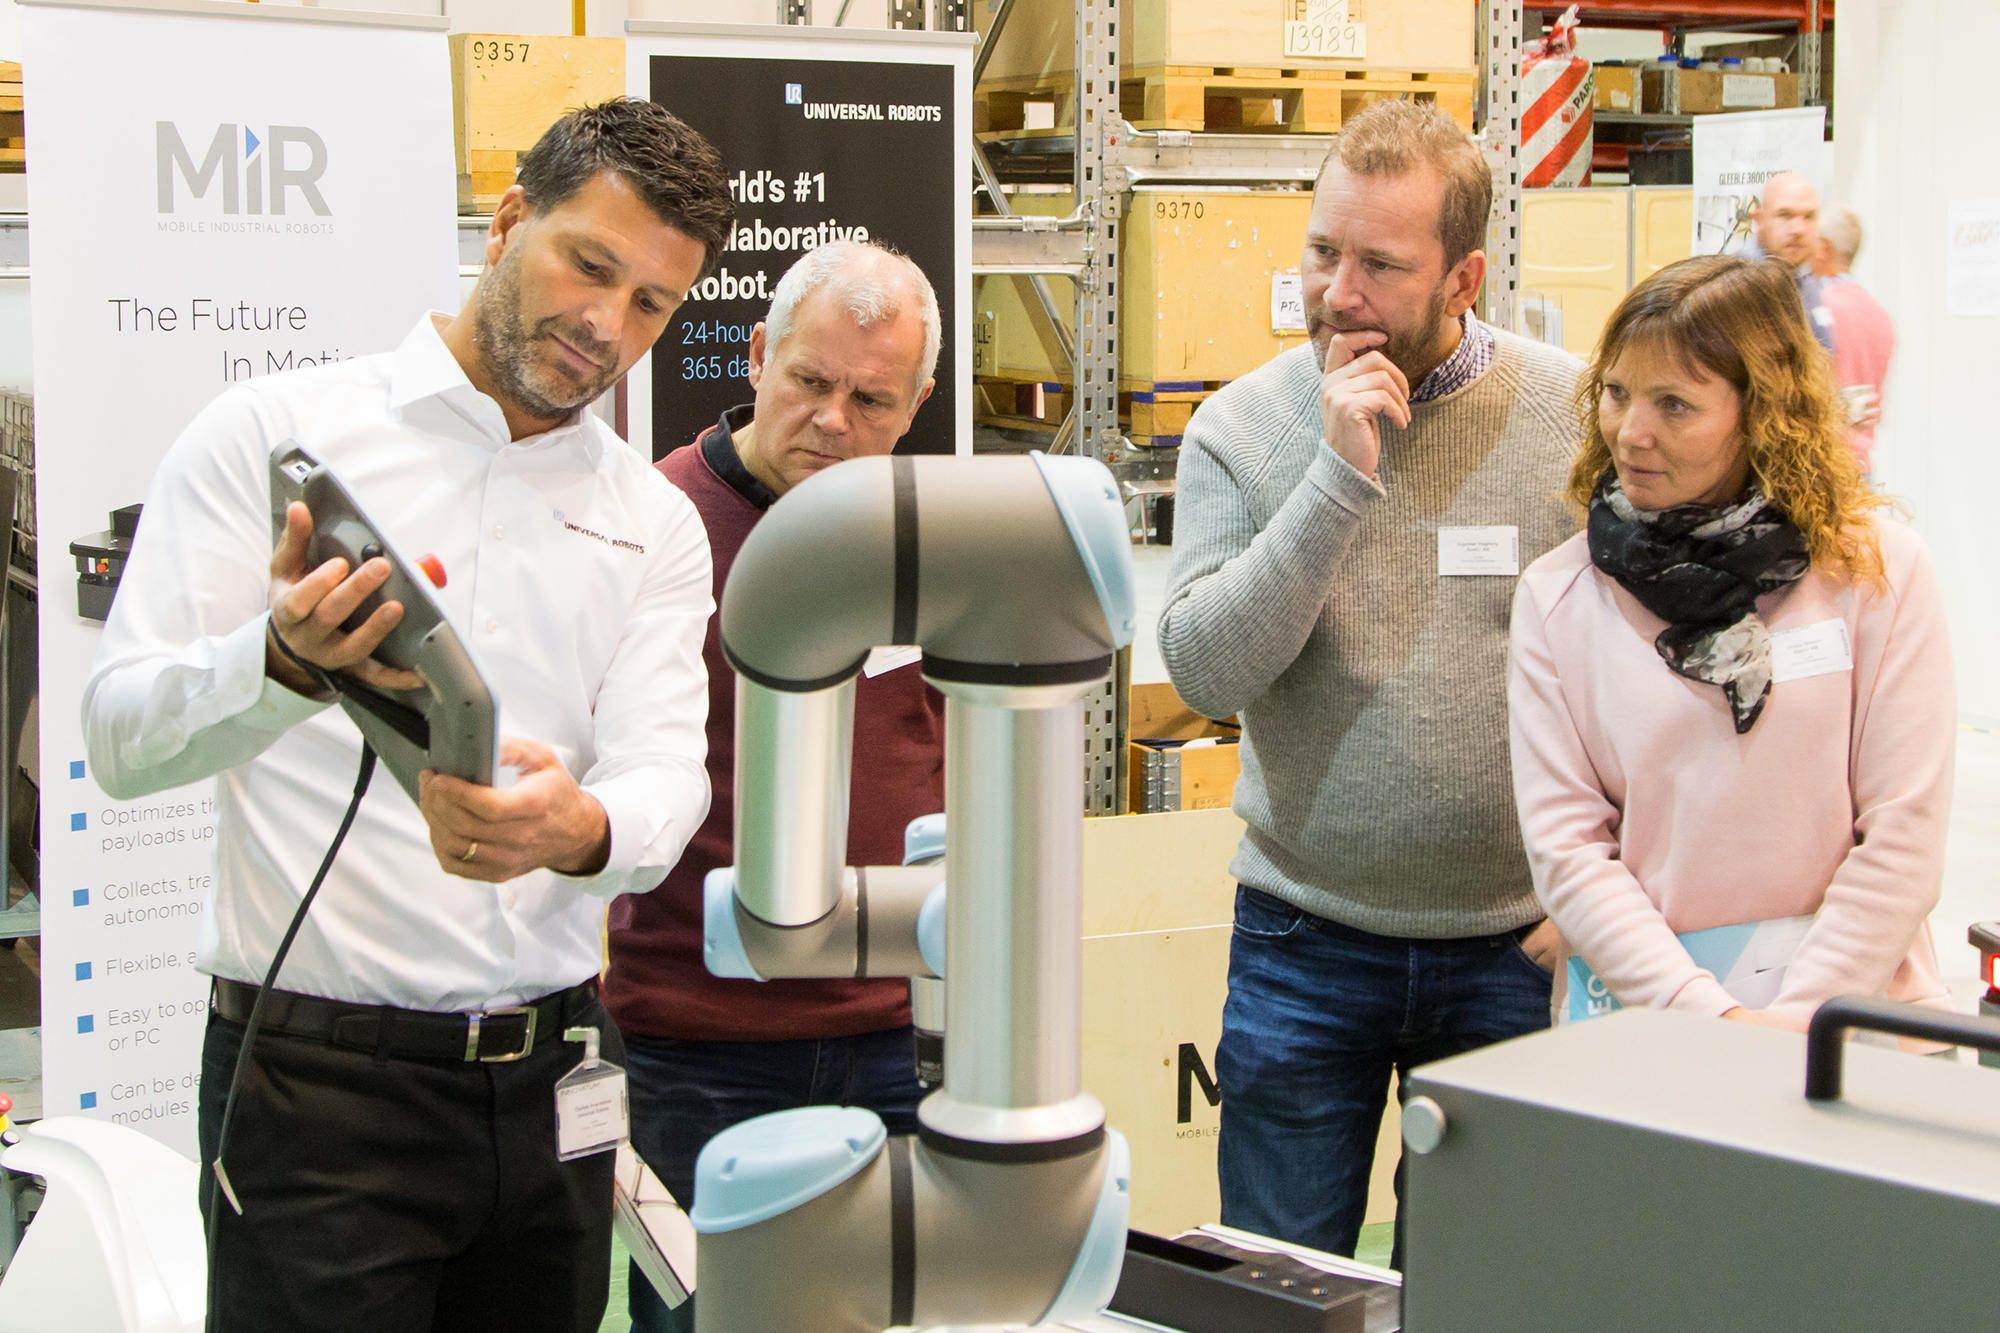 Demo Universal Robots